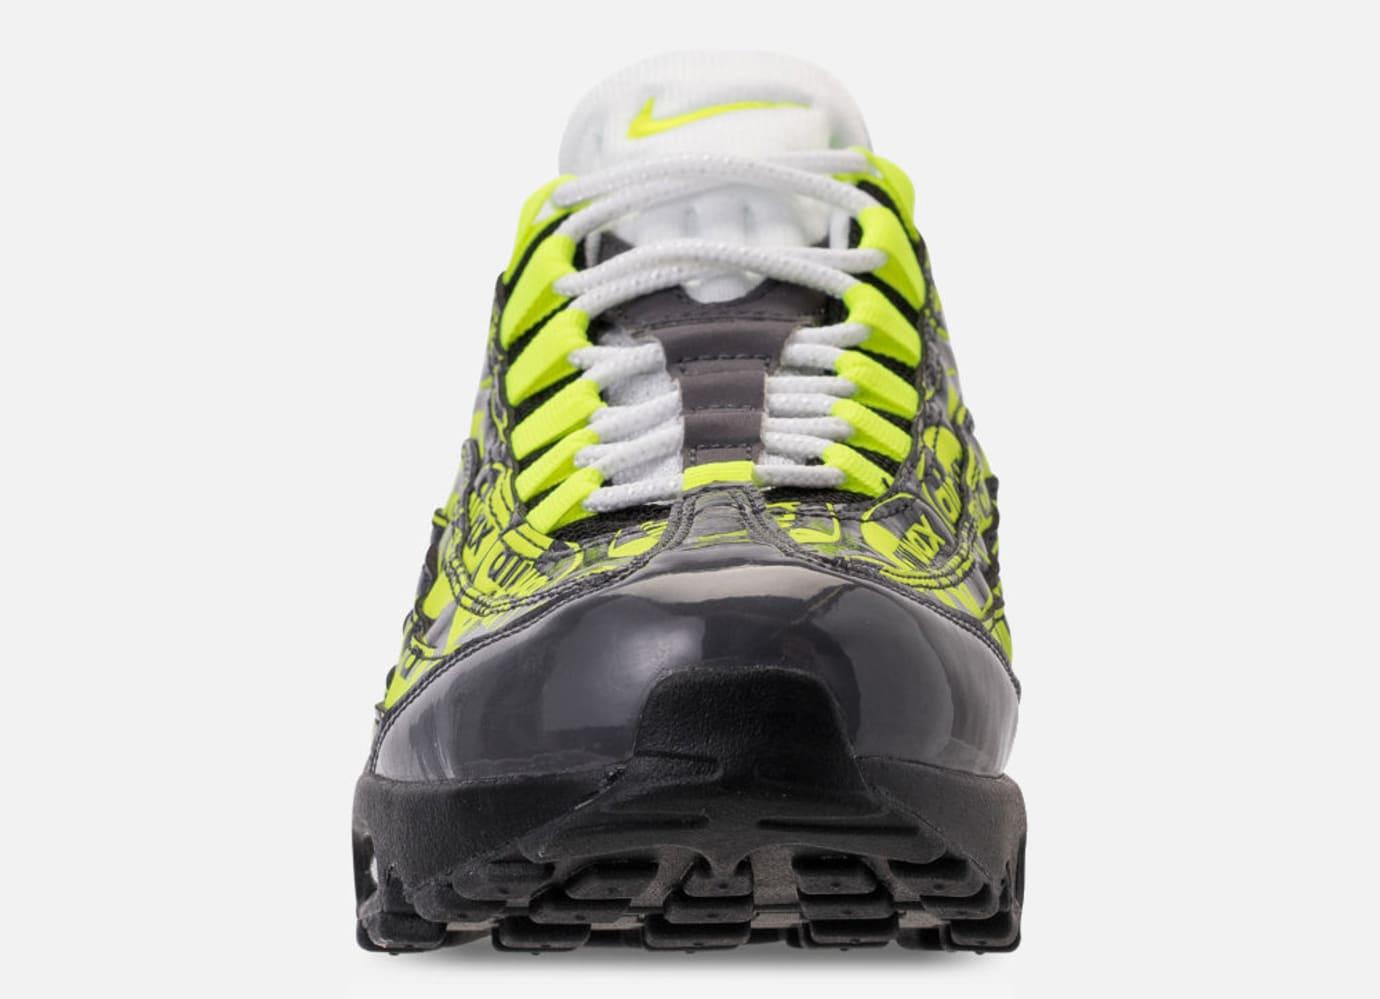 Nike Air Max 95 'Black/Volt/Ash White' 538416-019 (Toe)